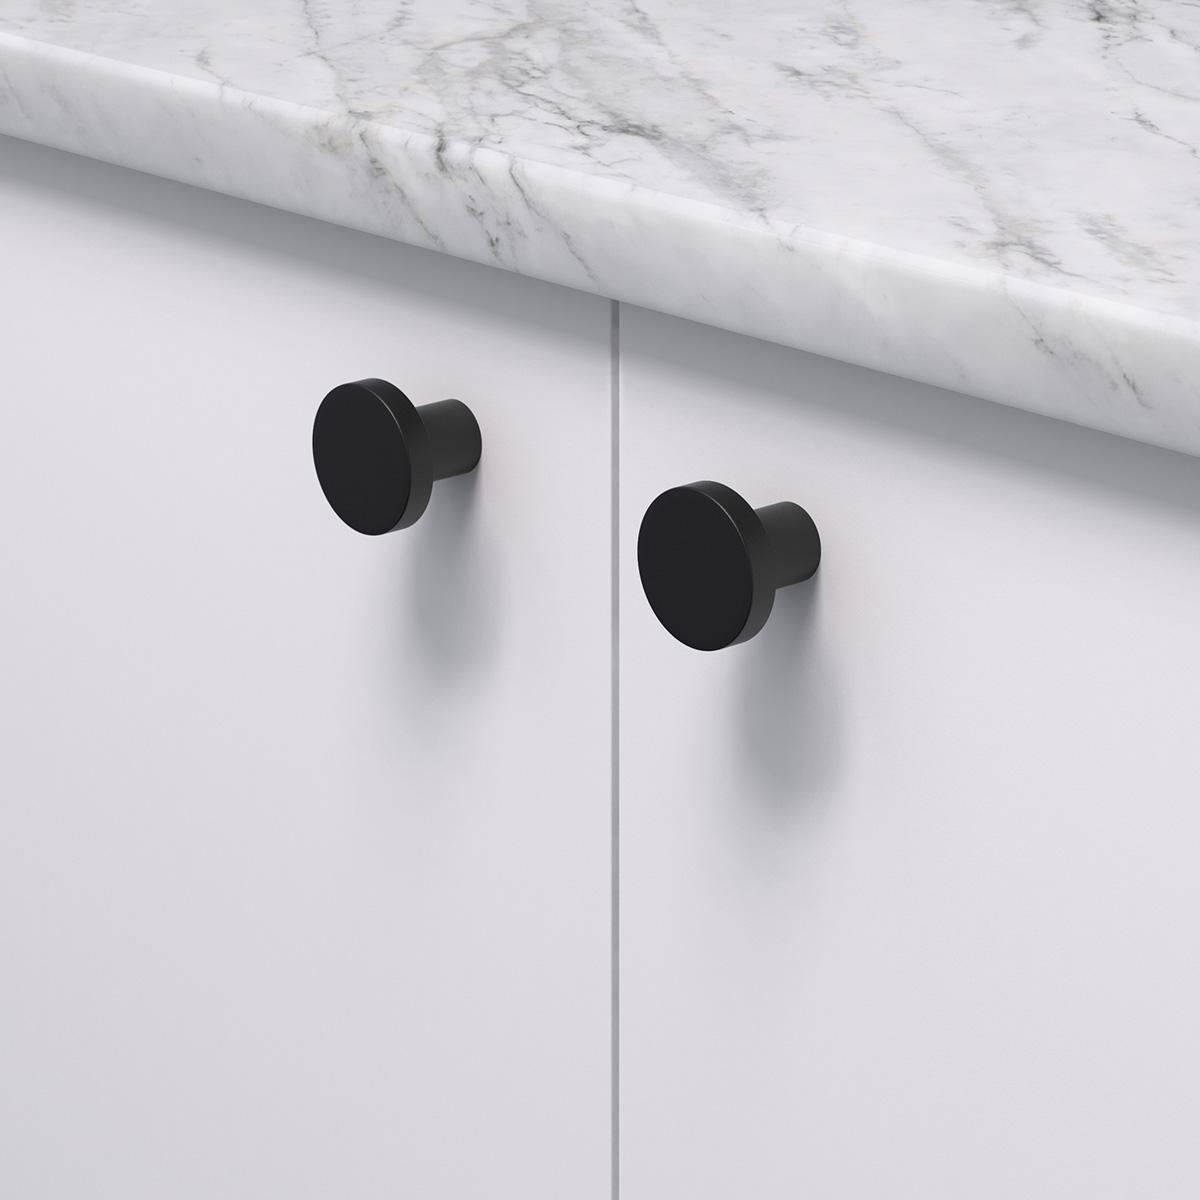 Knopp 2078 svart 368053 11 28 mm ncs s 0300 n marmor carrara